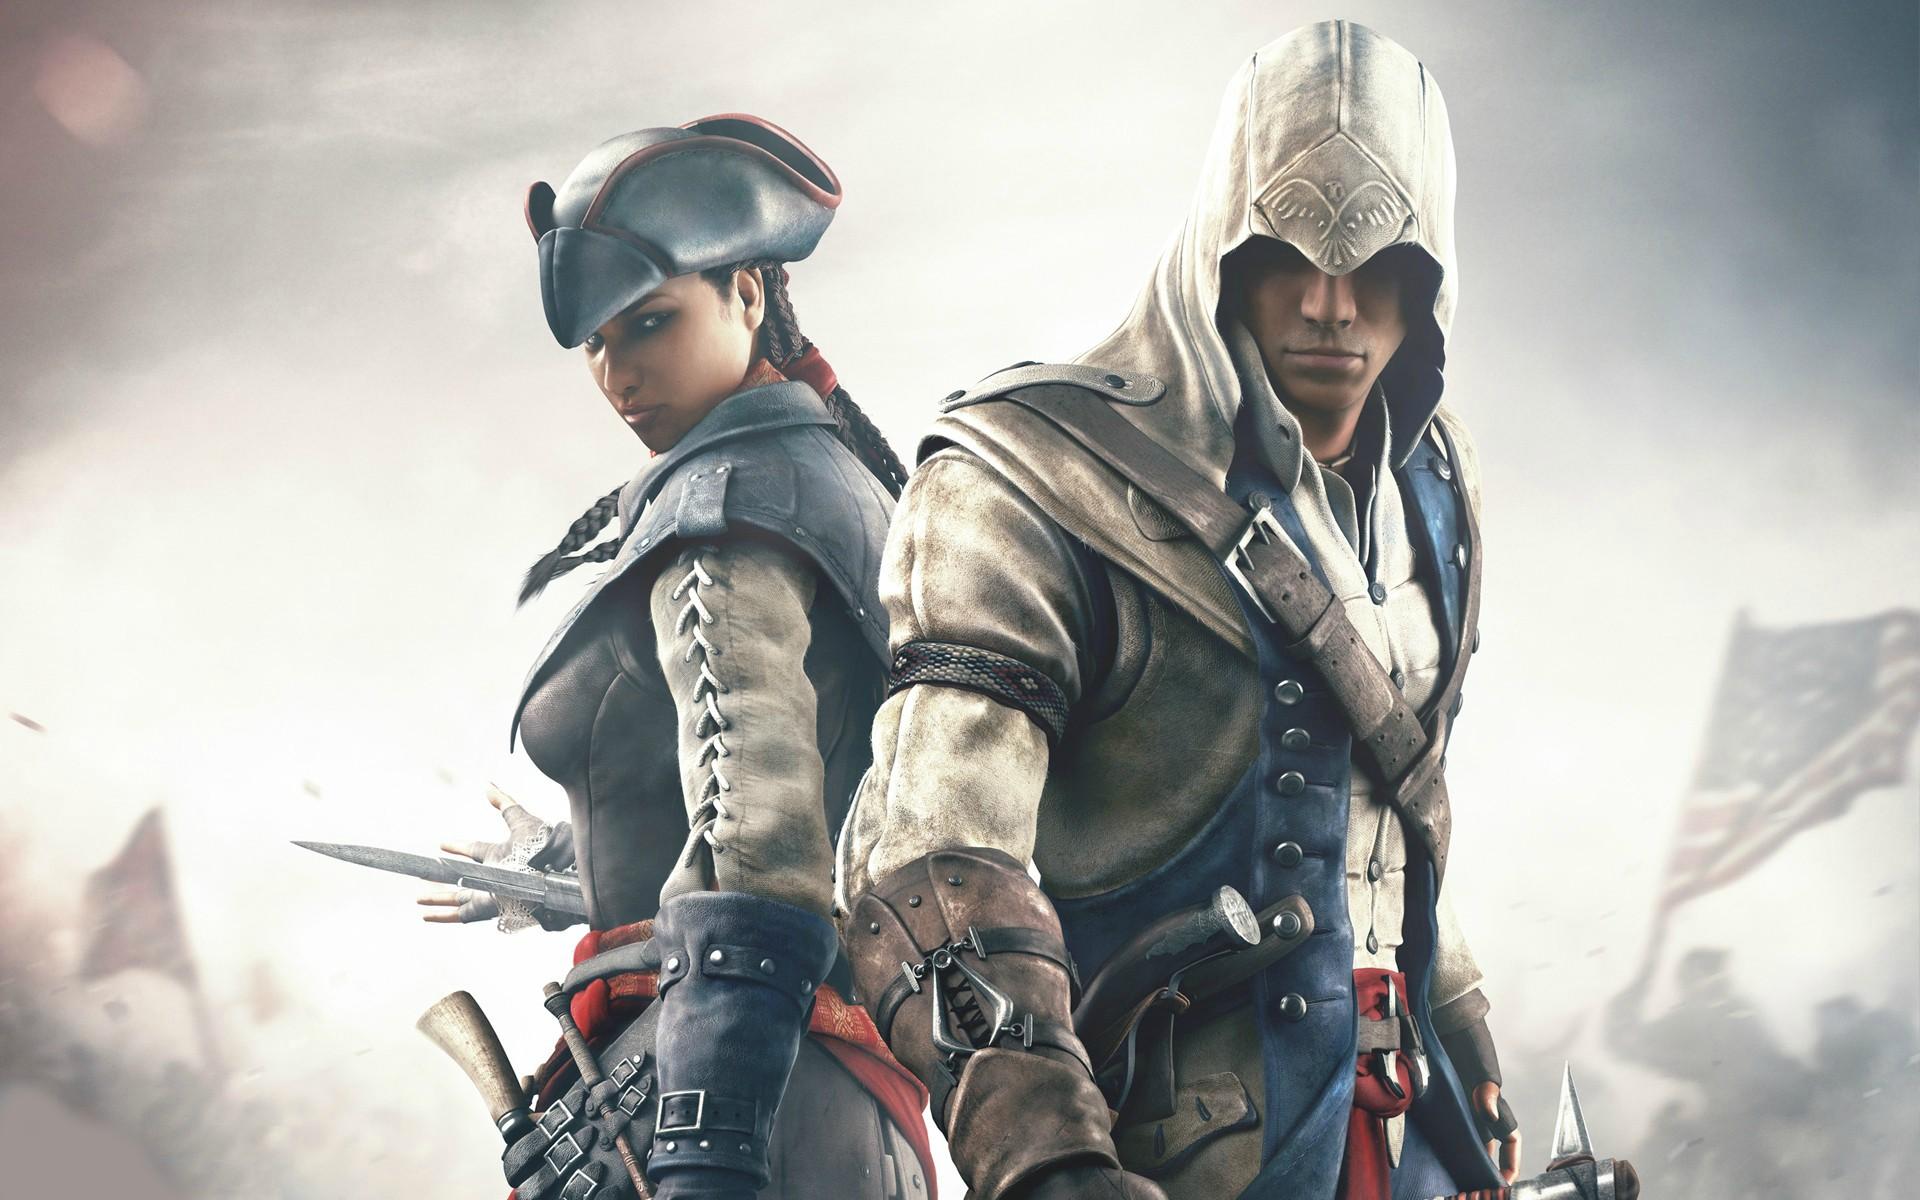 Assassins Creed 3 wallpaper 228632 1920x1200